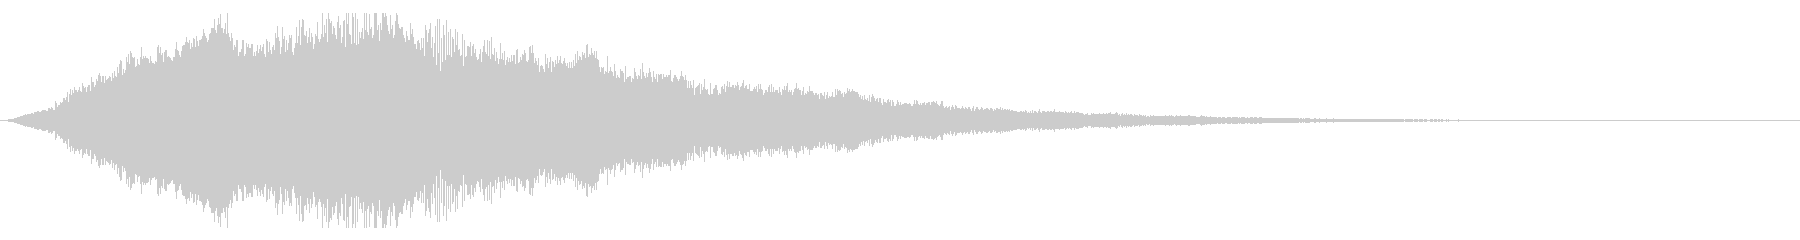 Dark_Attack-48の未再生の波形